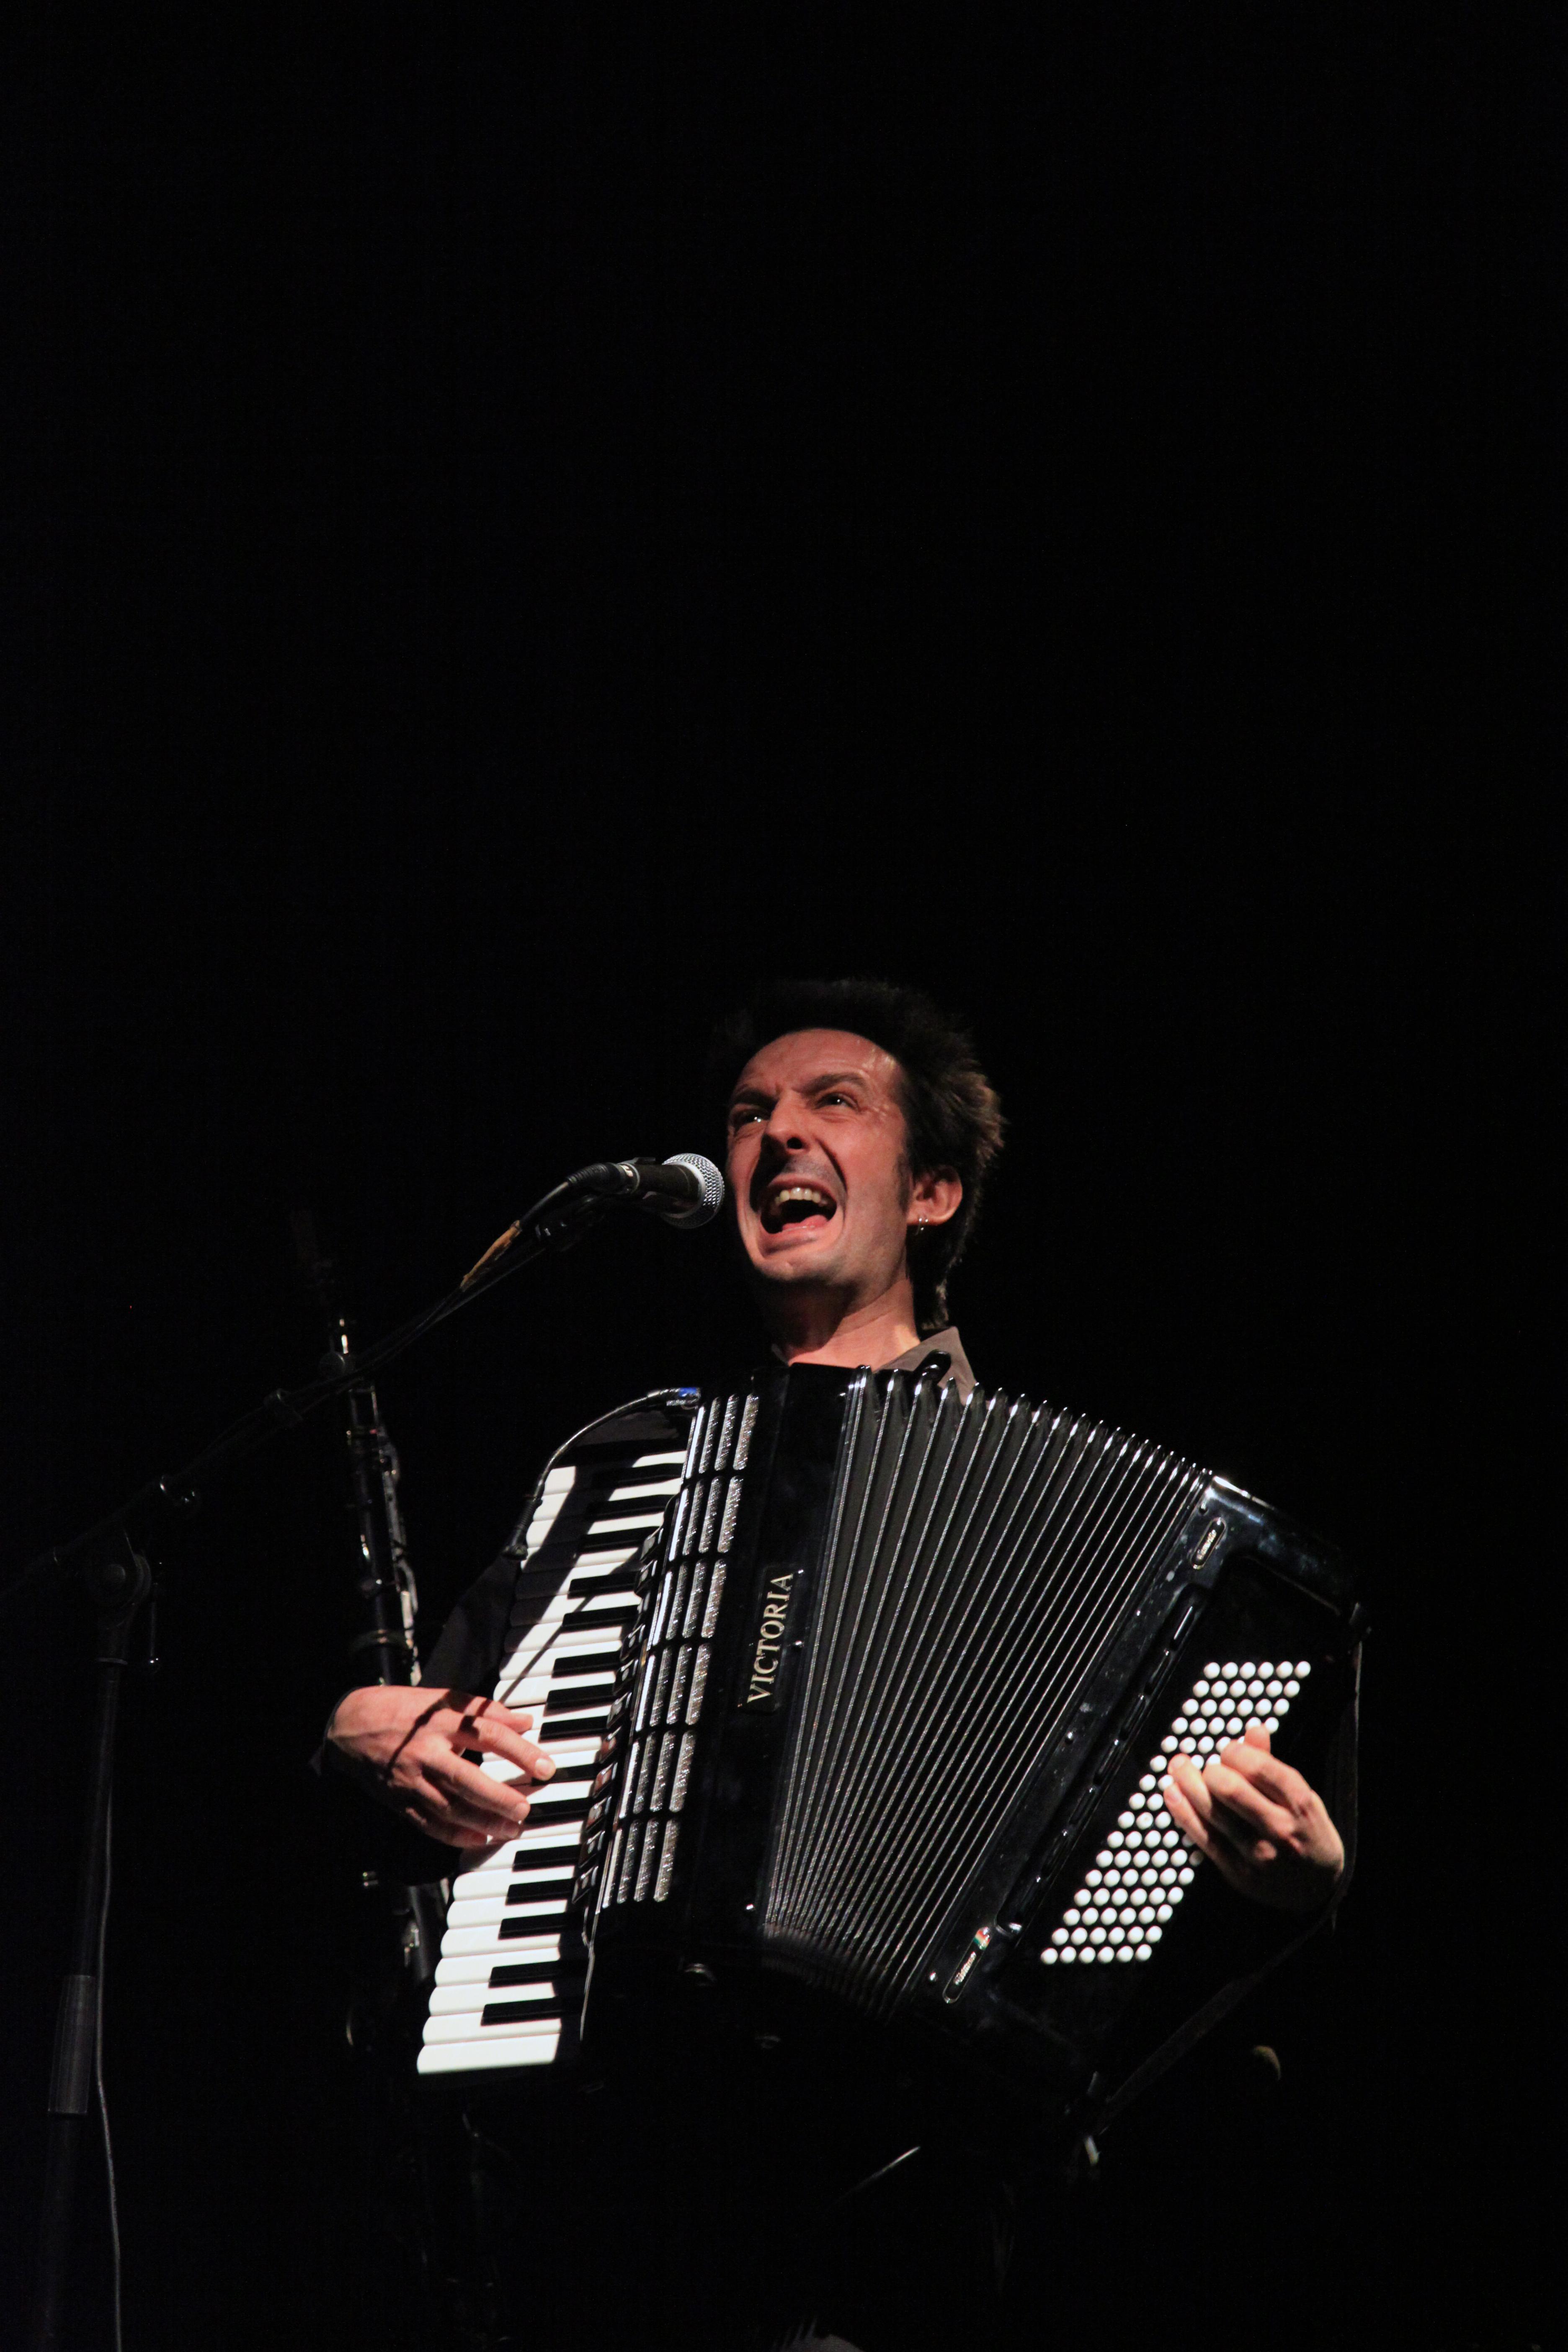 Nicolas Lescombe le musicien